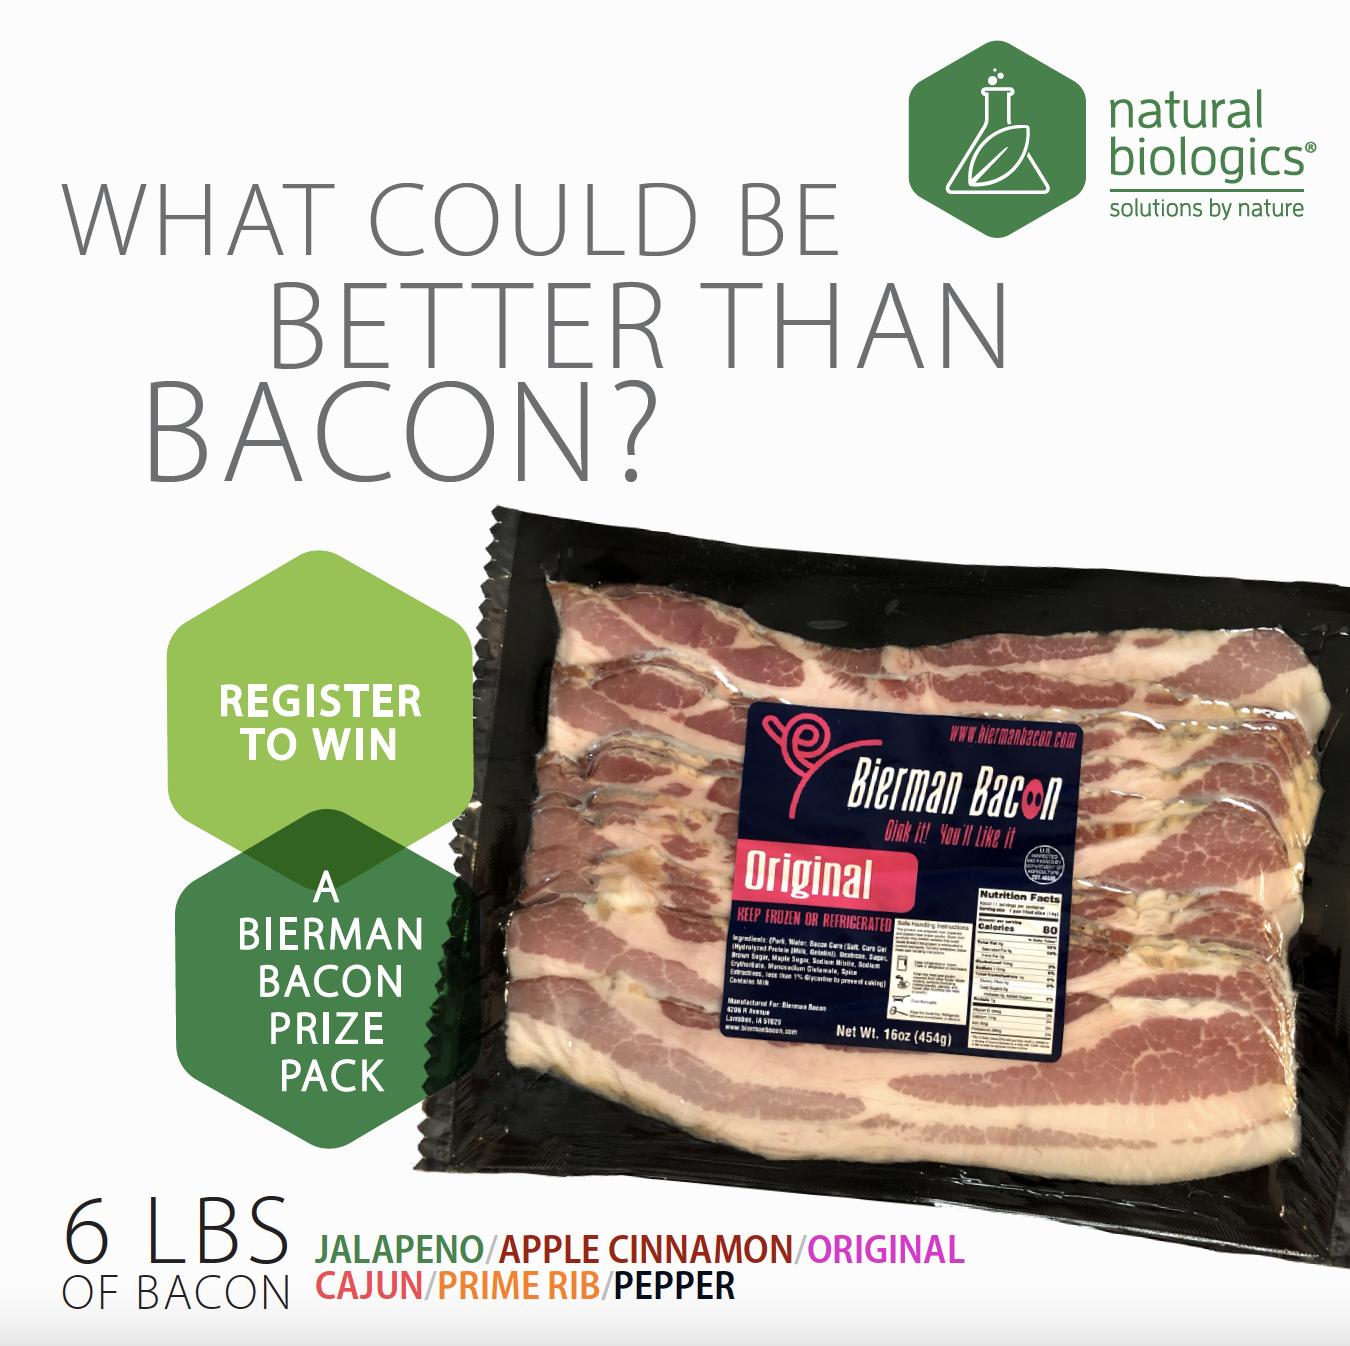 Win a Bierman Bacon Prize Pack!